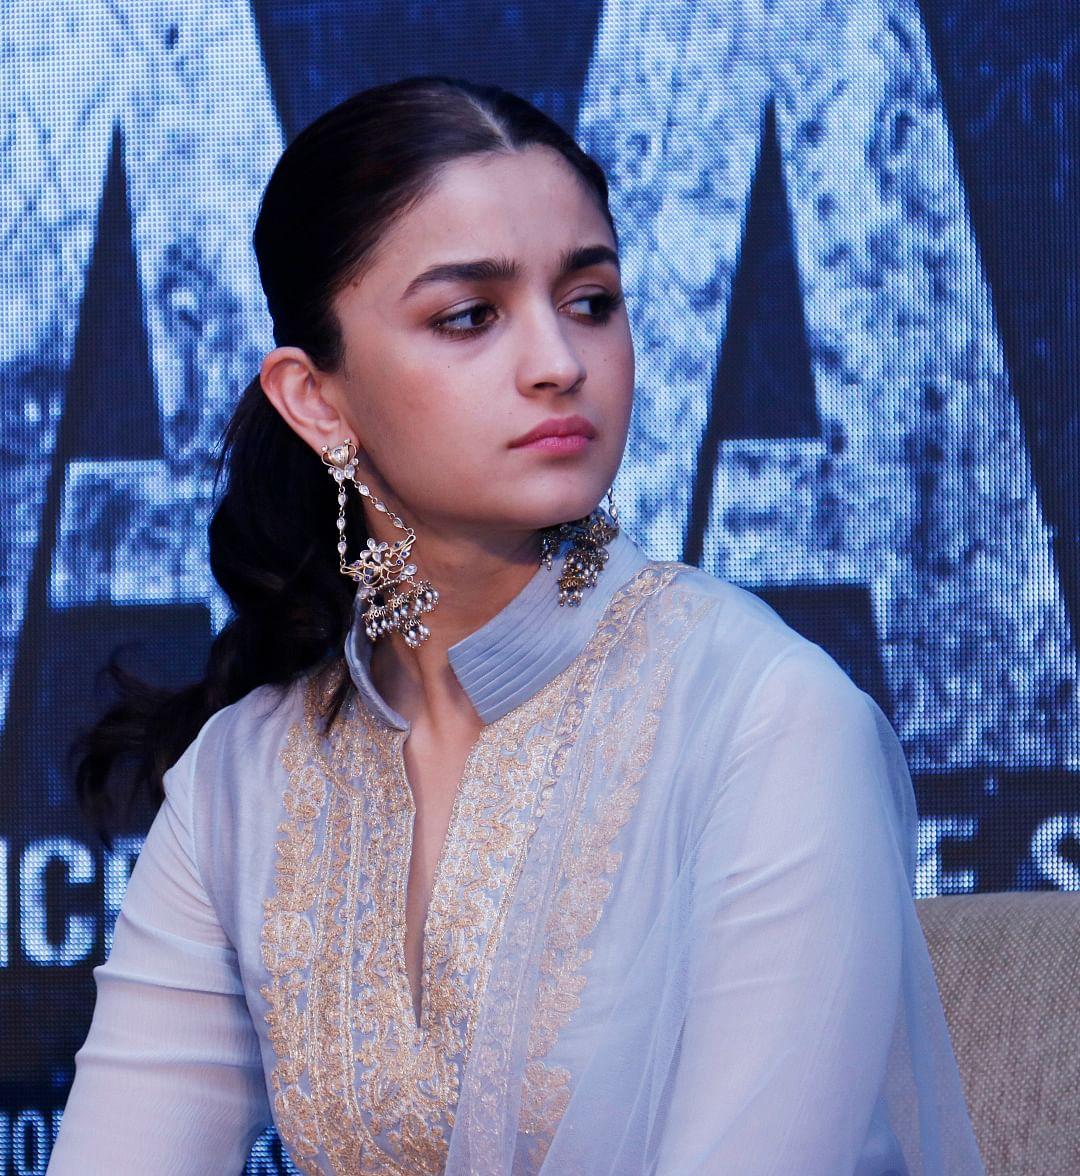 Alia Bhatt at the song launch.